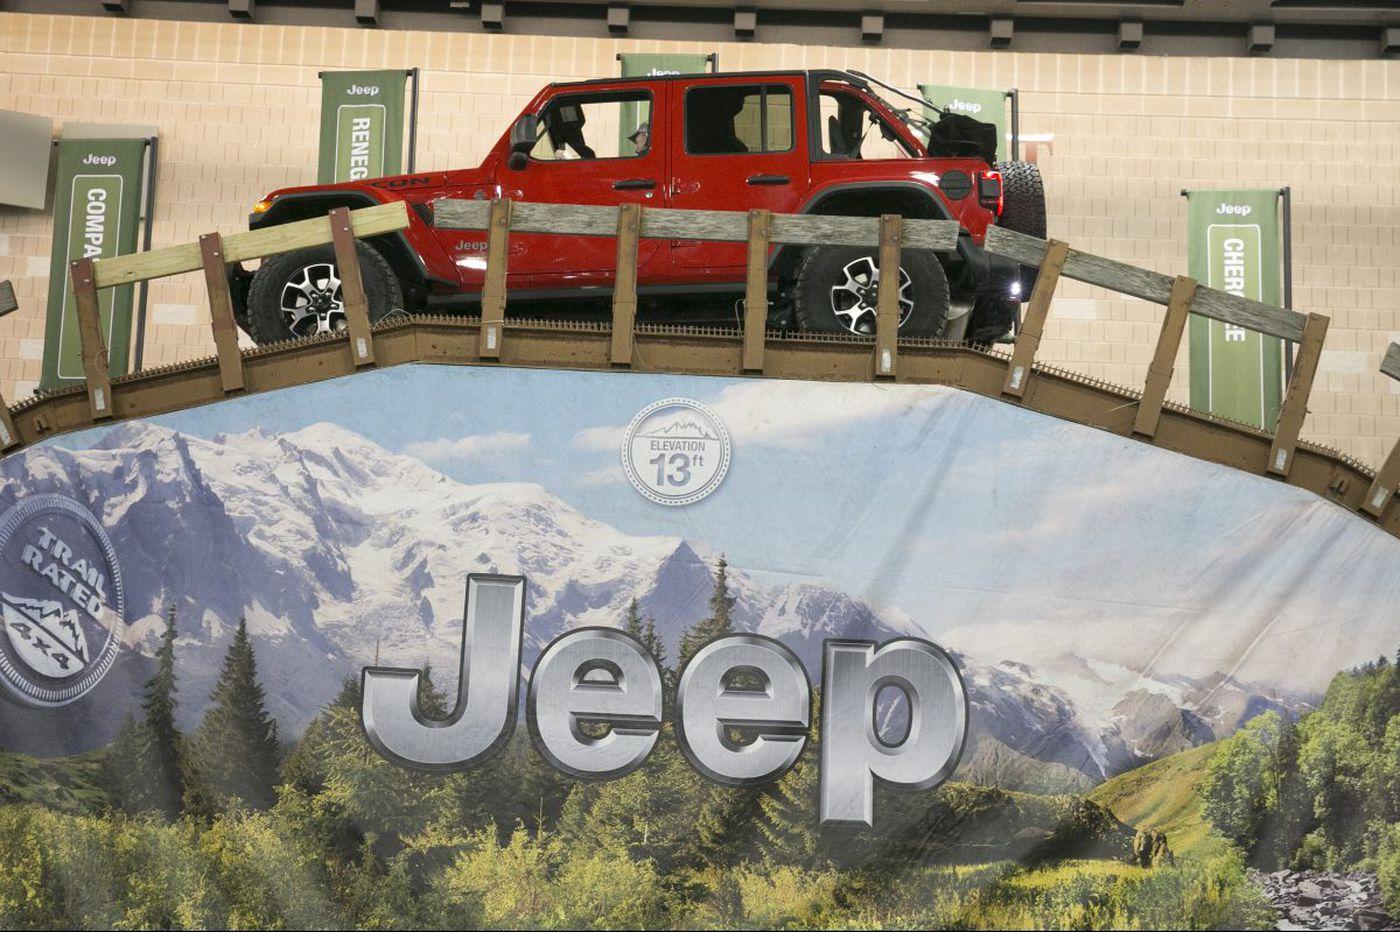 New technology, new trucks top 2018 Philadelphia Auto Show sights